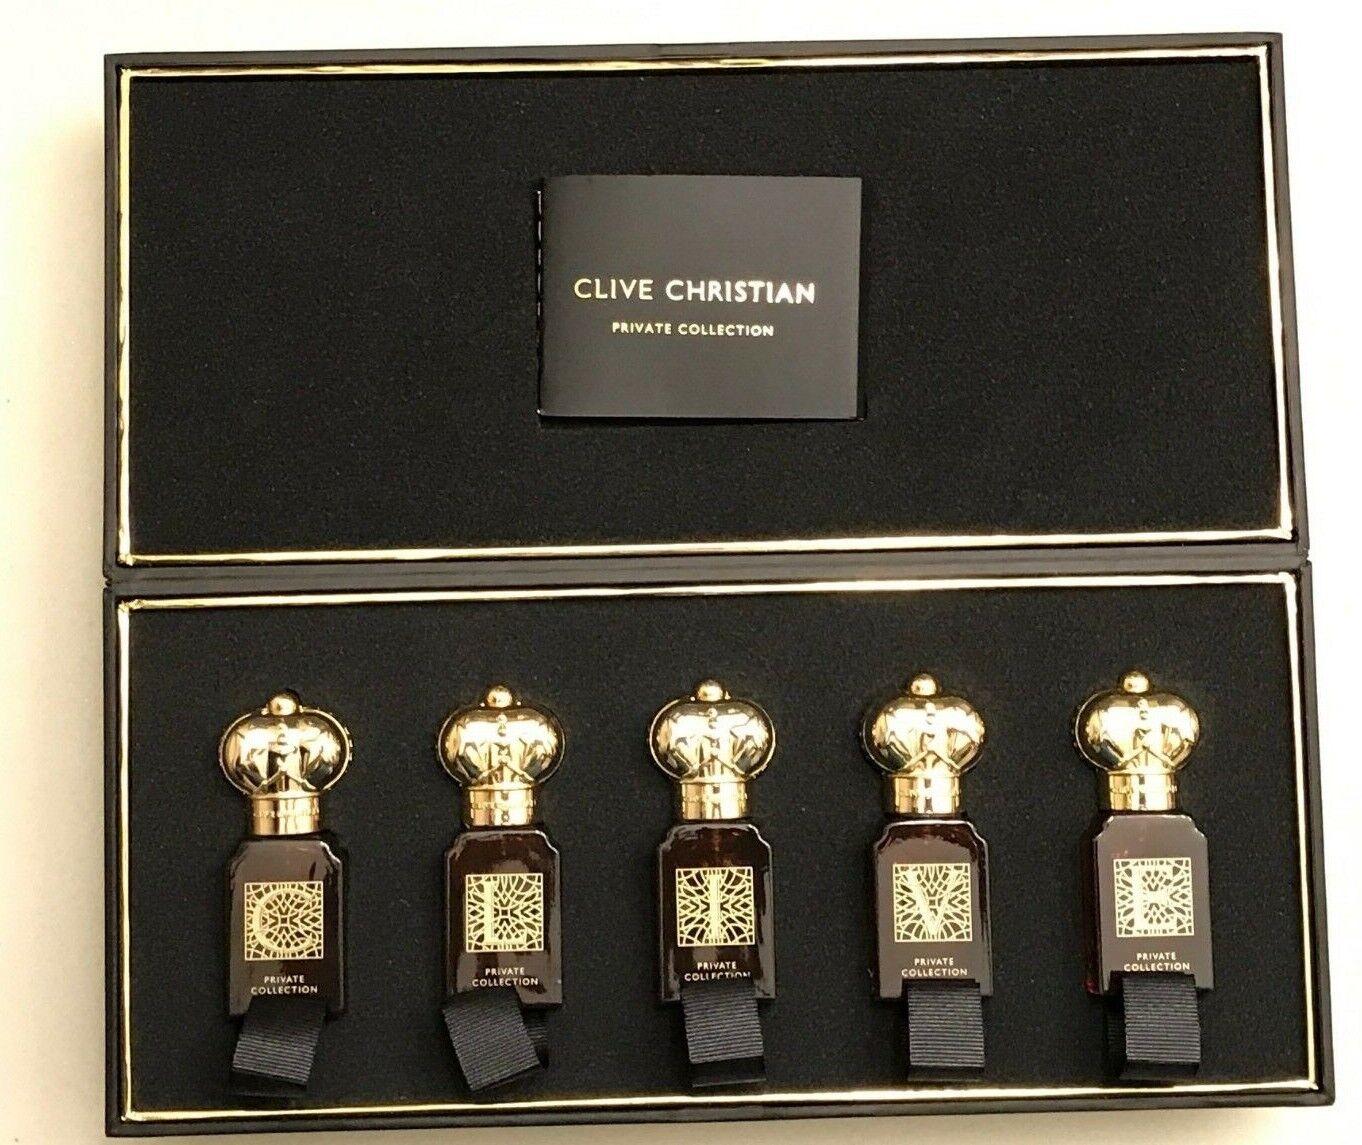 Clive Christian C L I V E 5ml Perfume spray Men Private Coll